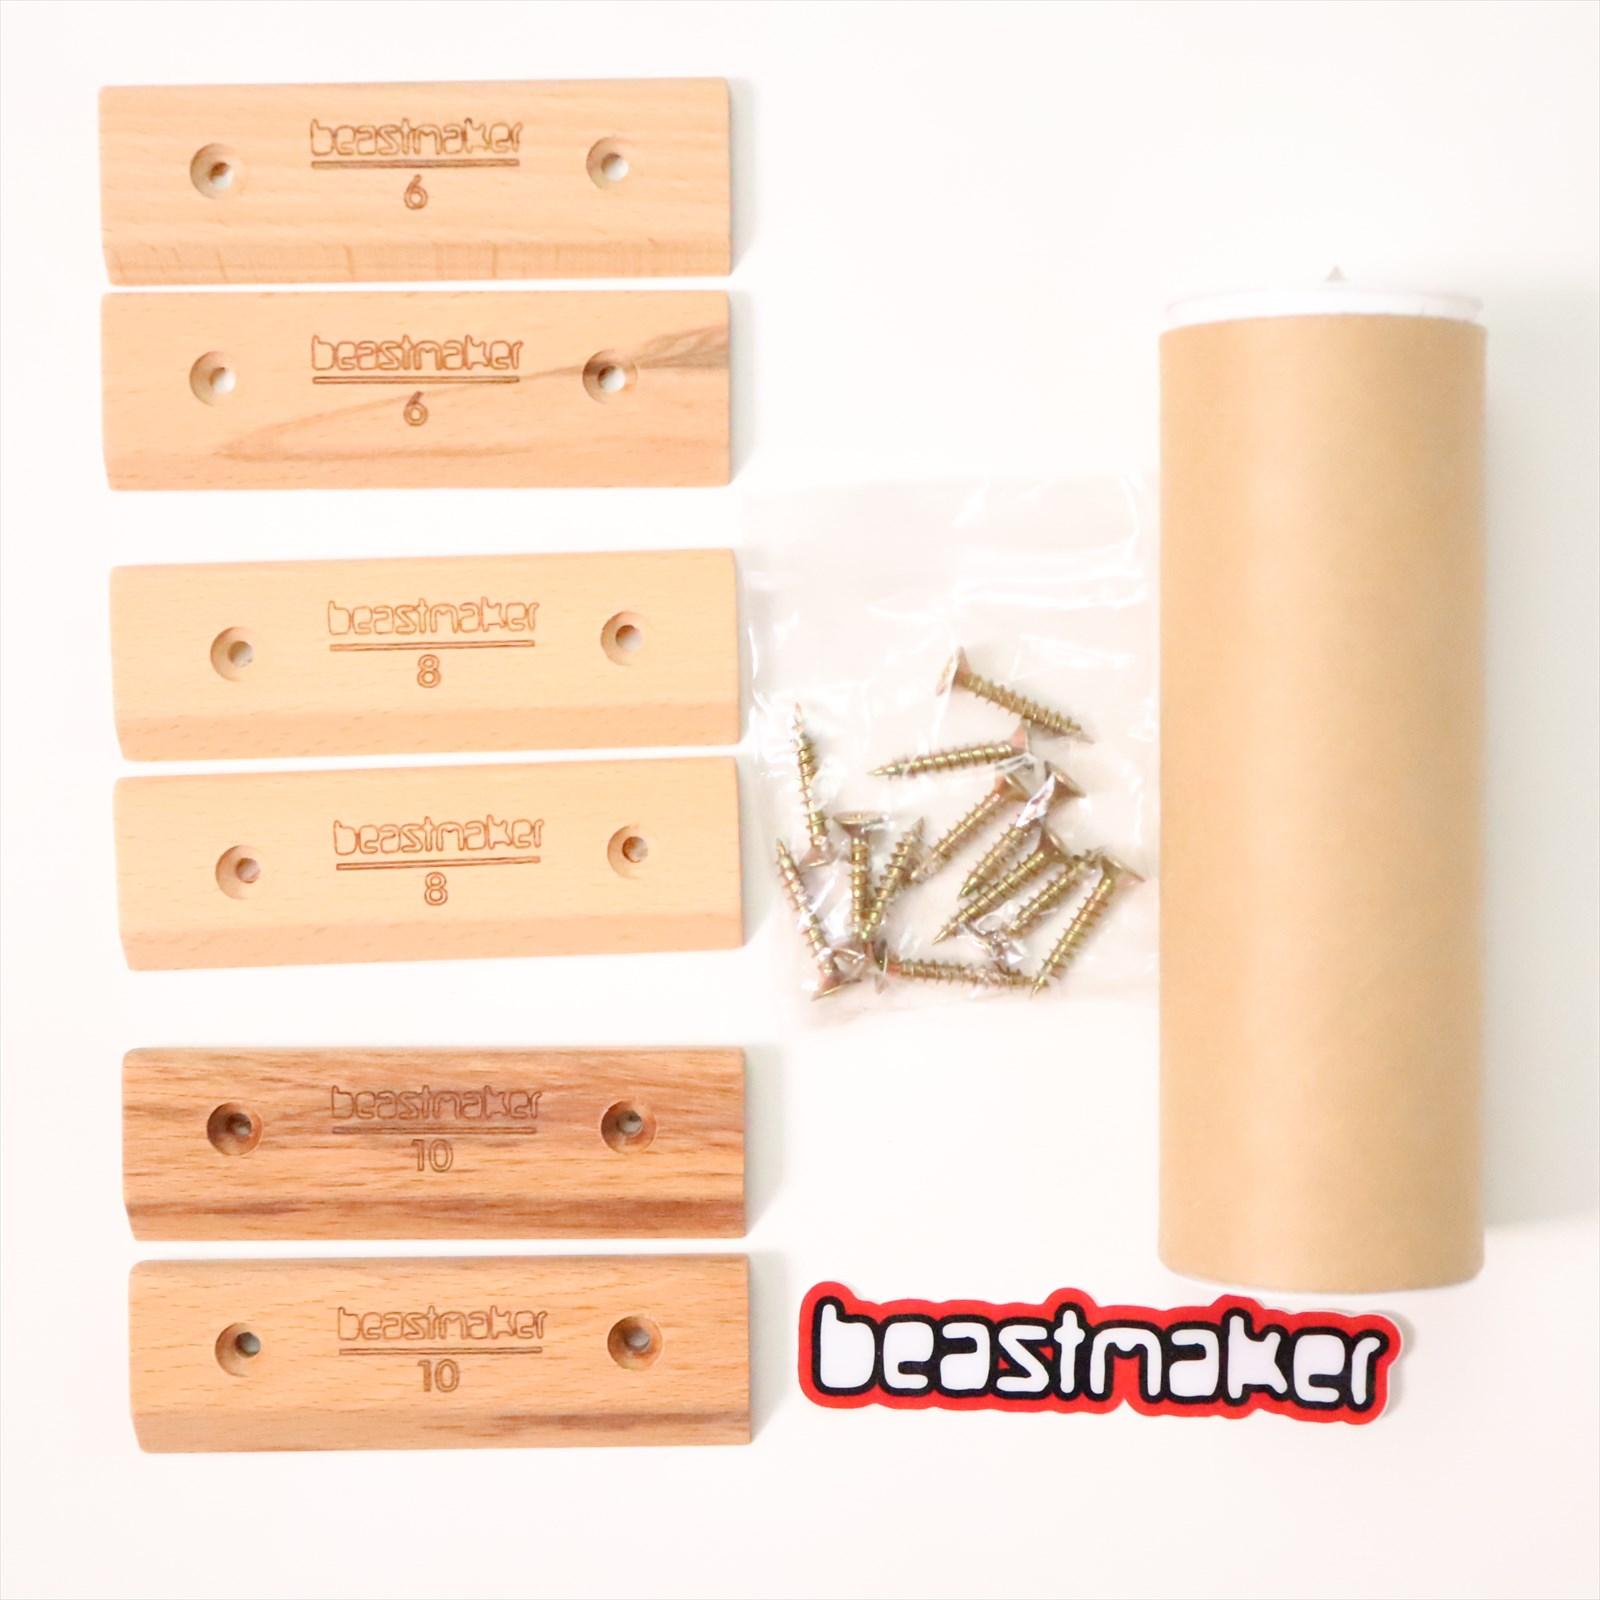 Beastmaker ビーストメーカー Micros